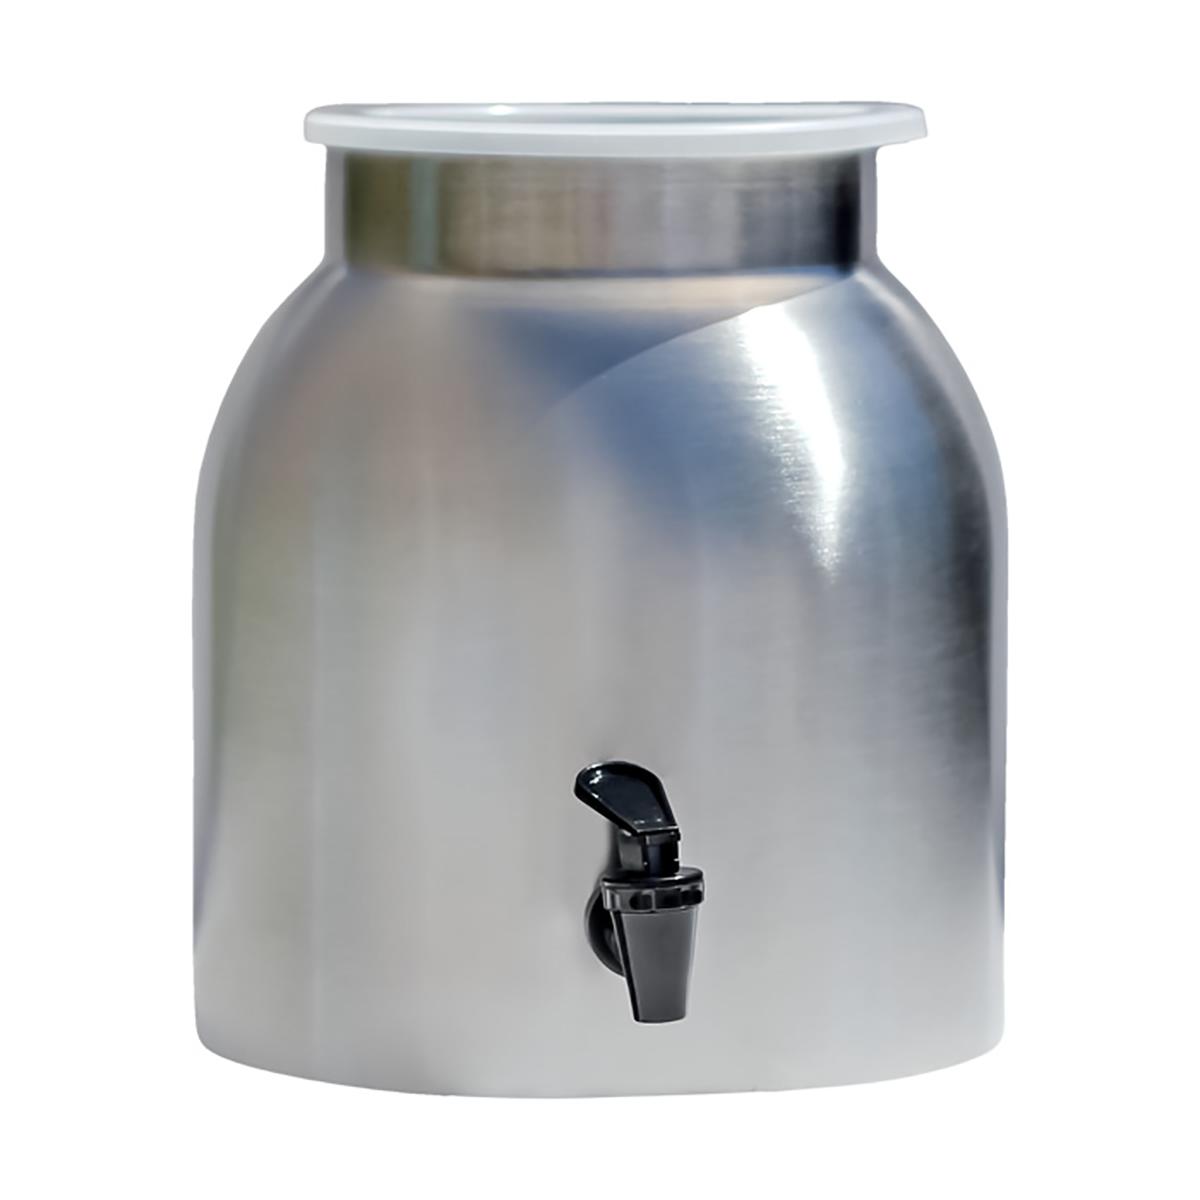 Stainless Steel Crock Water Dispenser Thrive Market